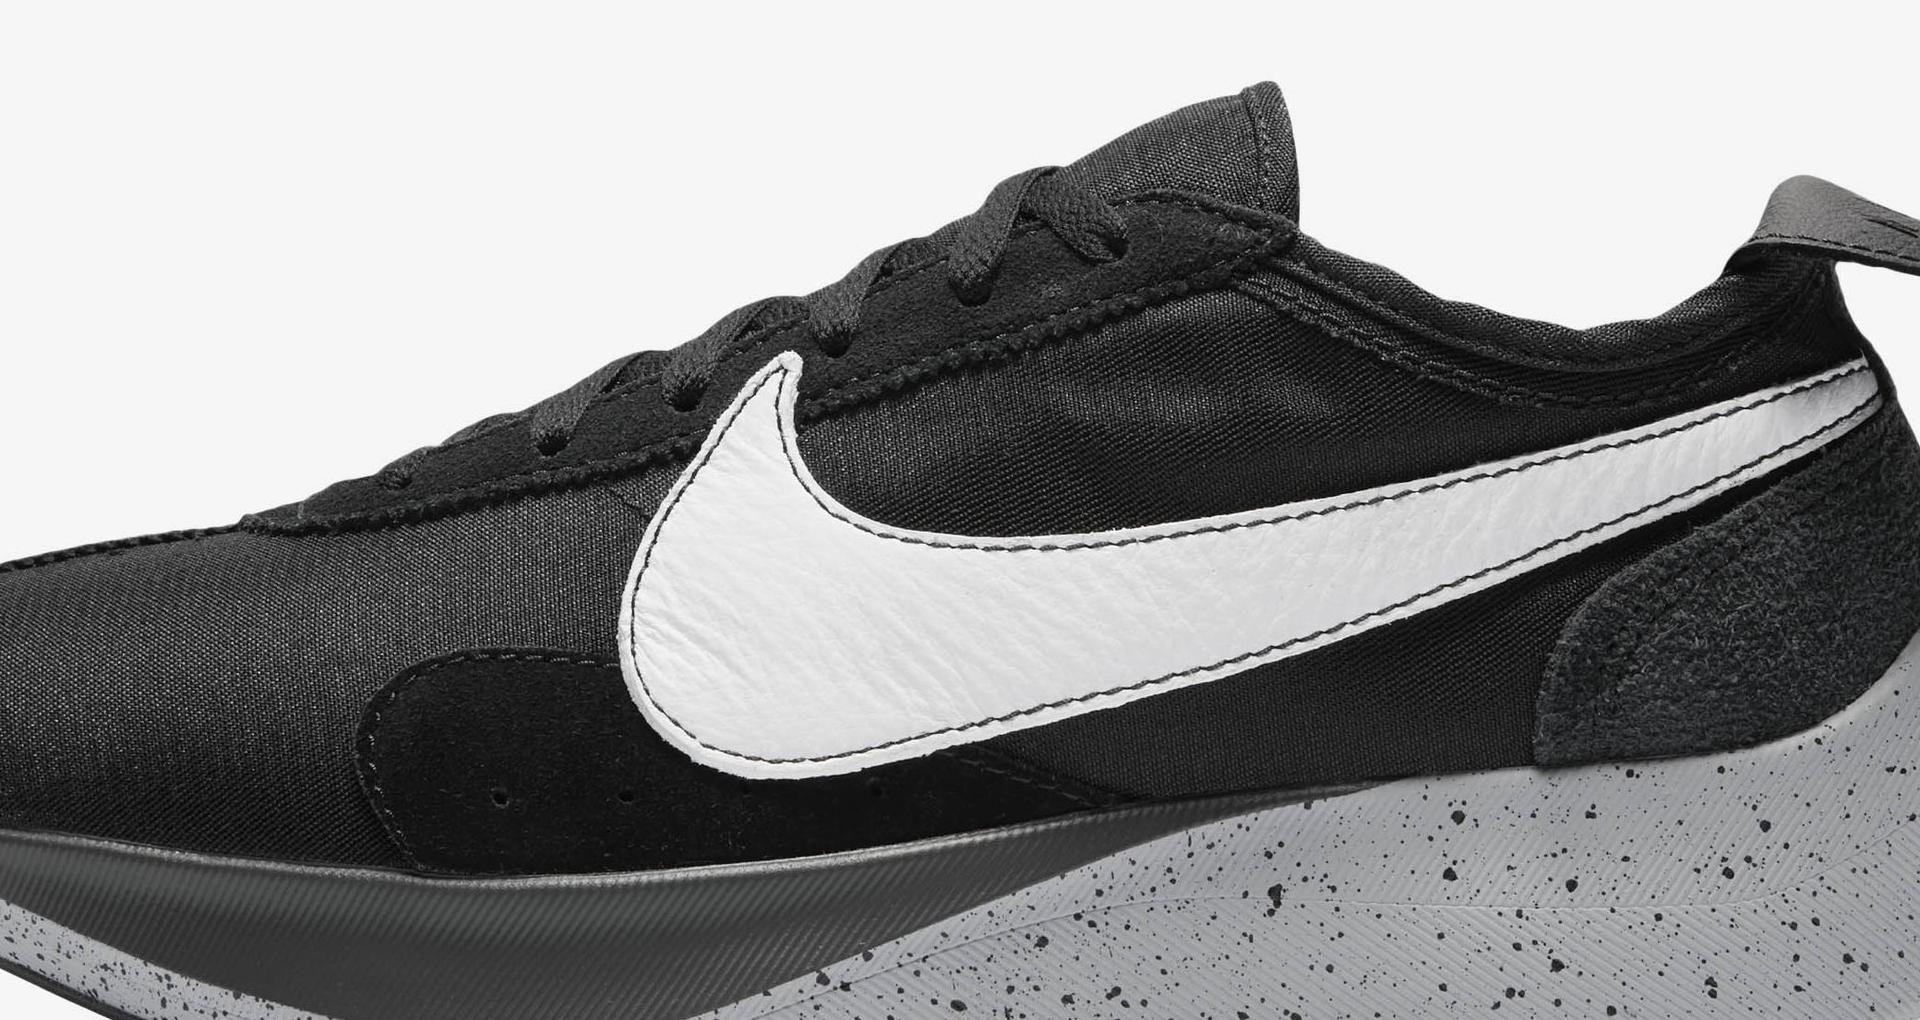 cc8fcbd2bf02 Nike Moon Racer  Black   White   Wolf Grey  Release Date. Nike+ SNKRS